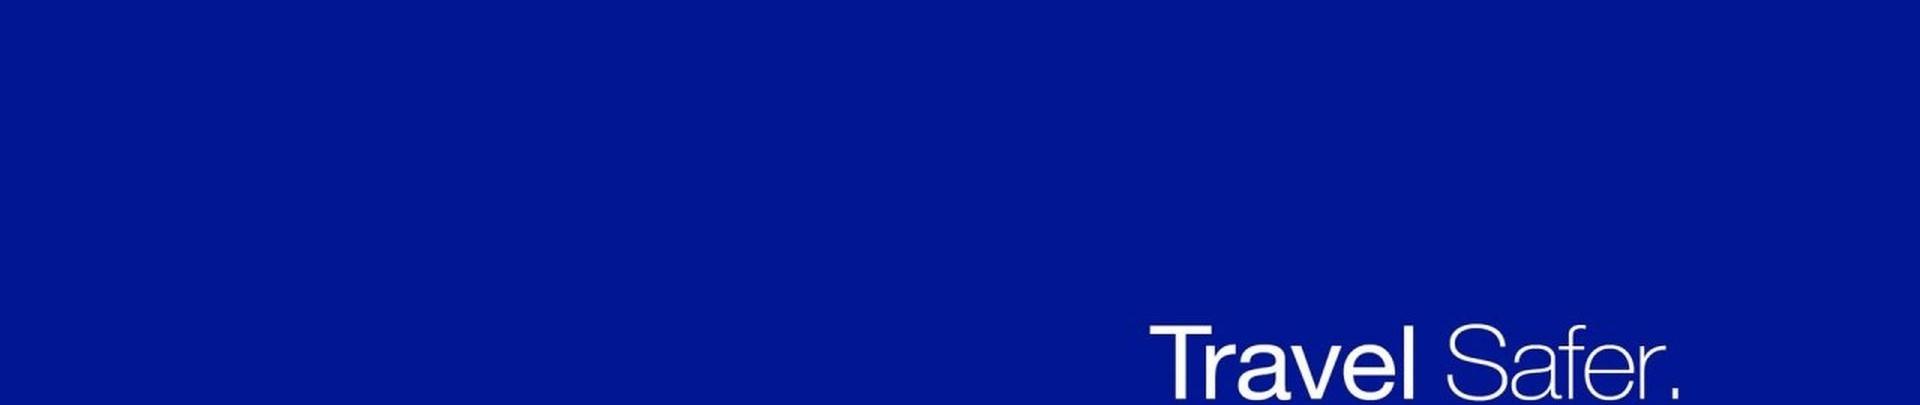 masthead-GNI-header1 (1)